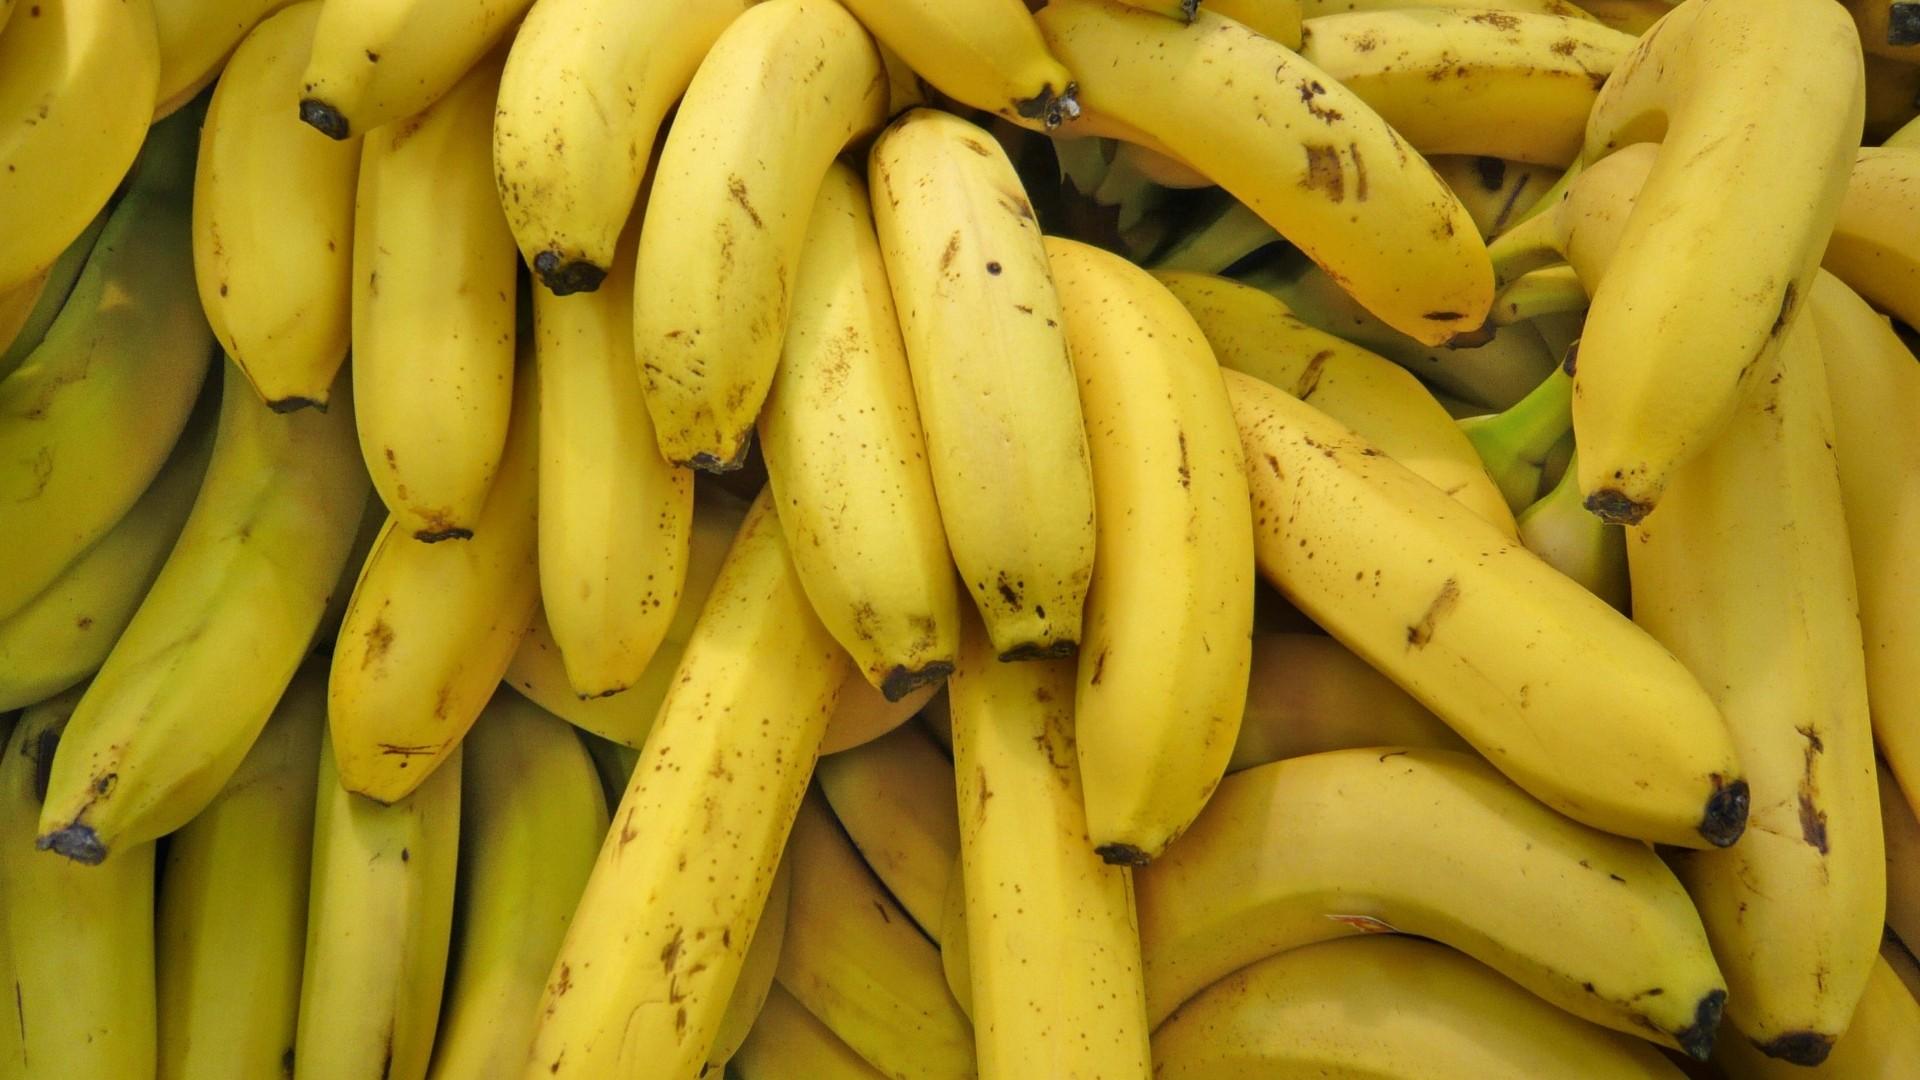 Banana Download Wallpaper